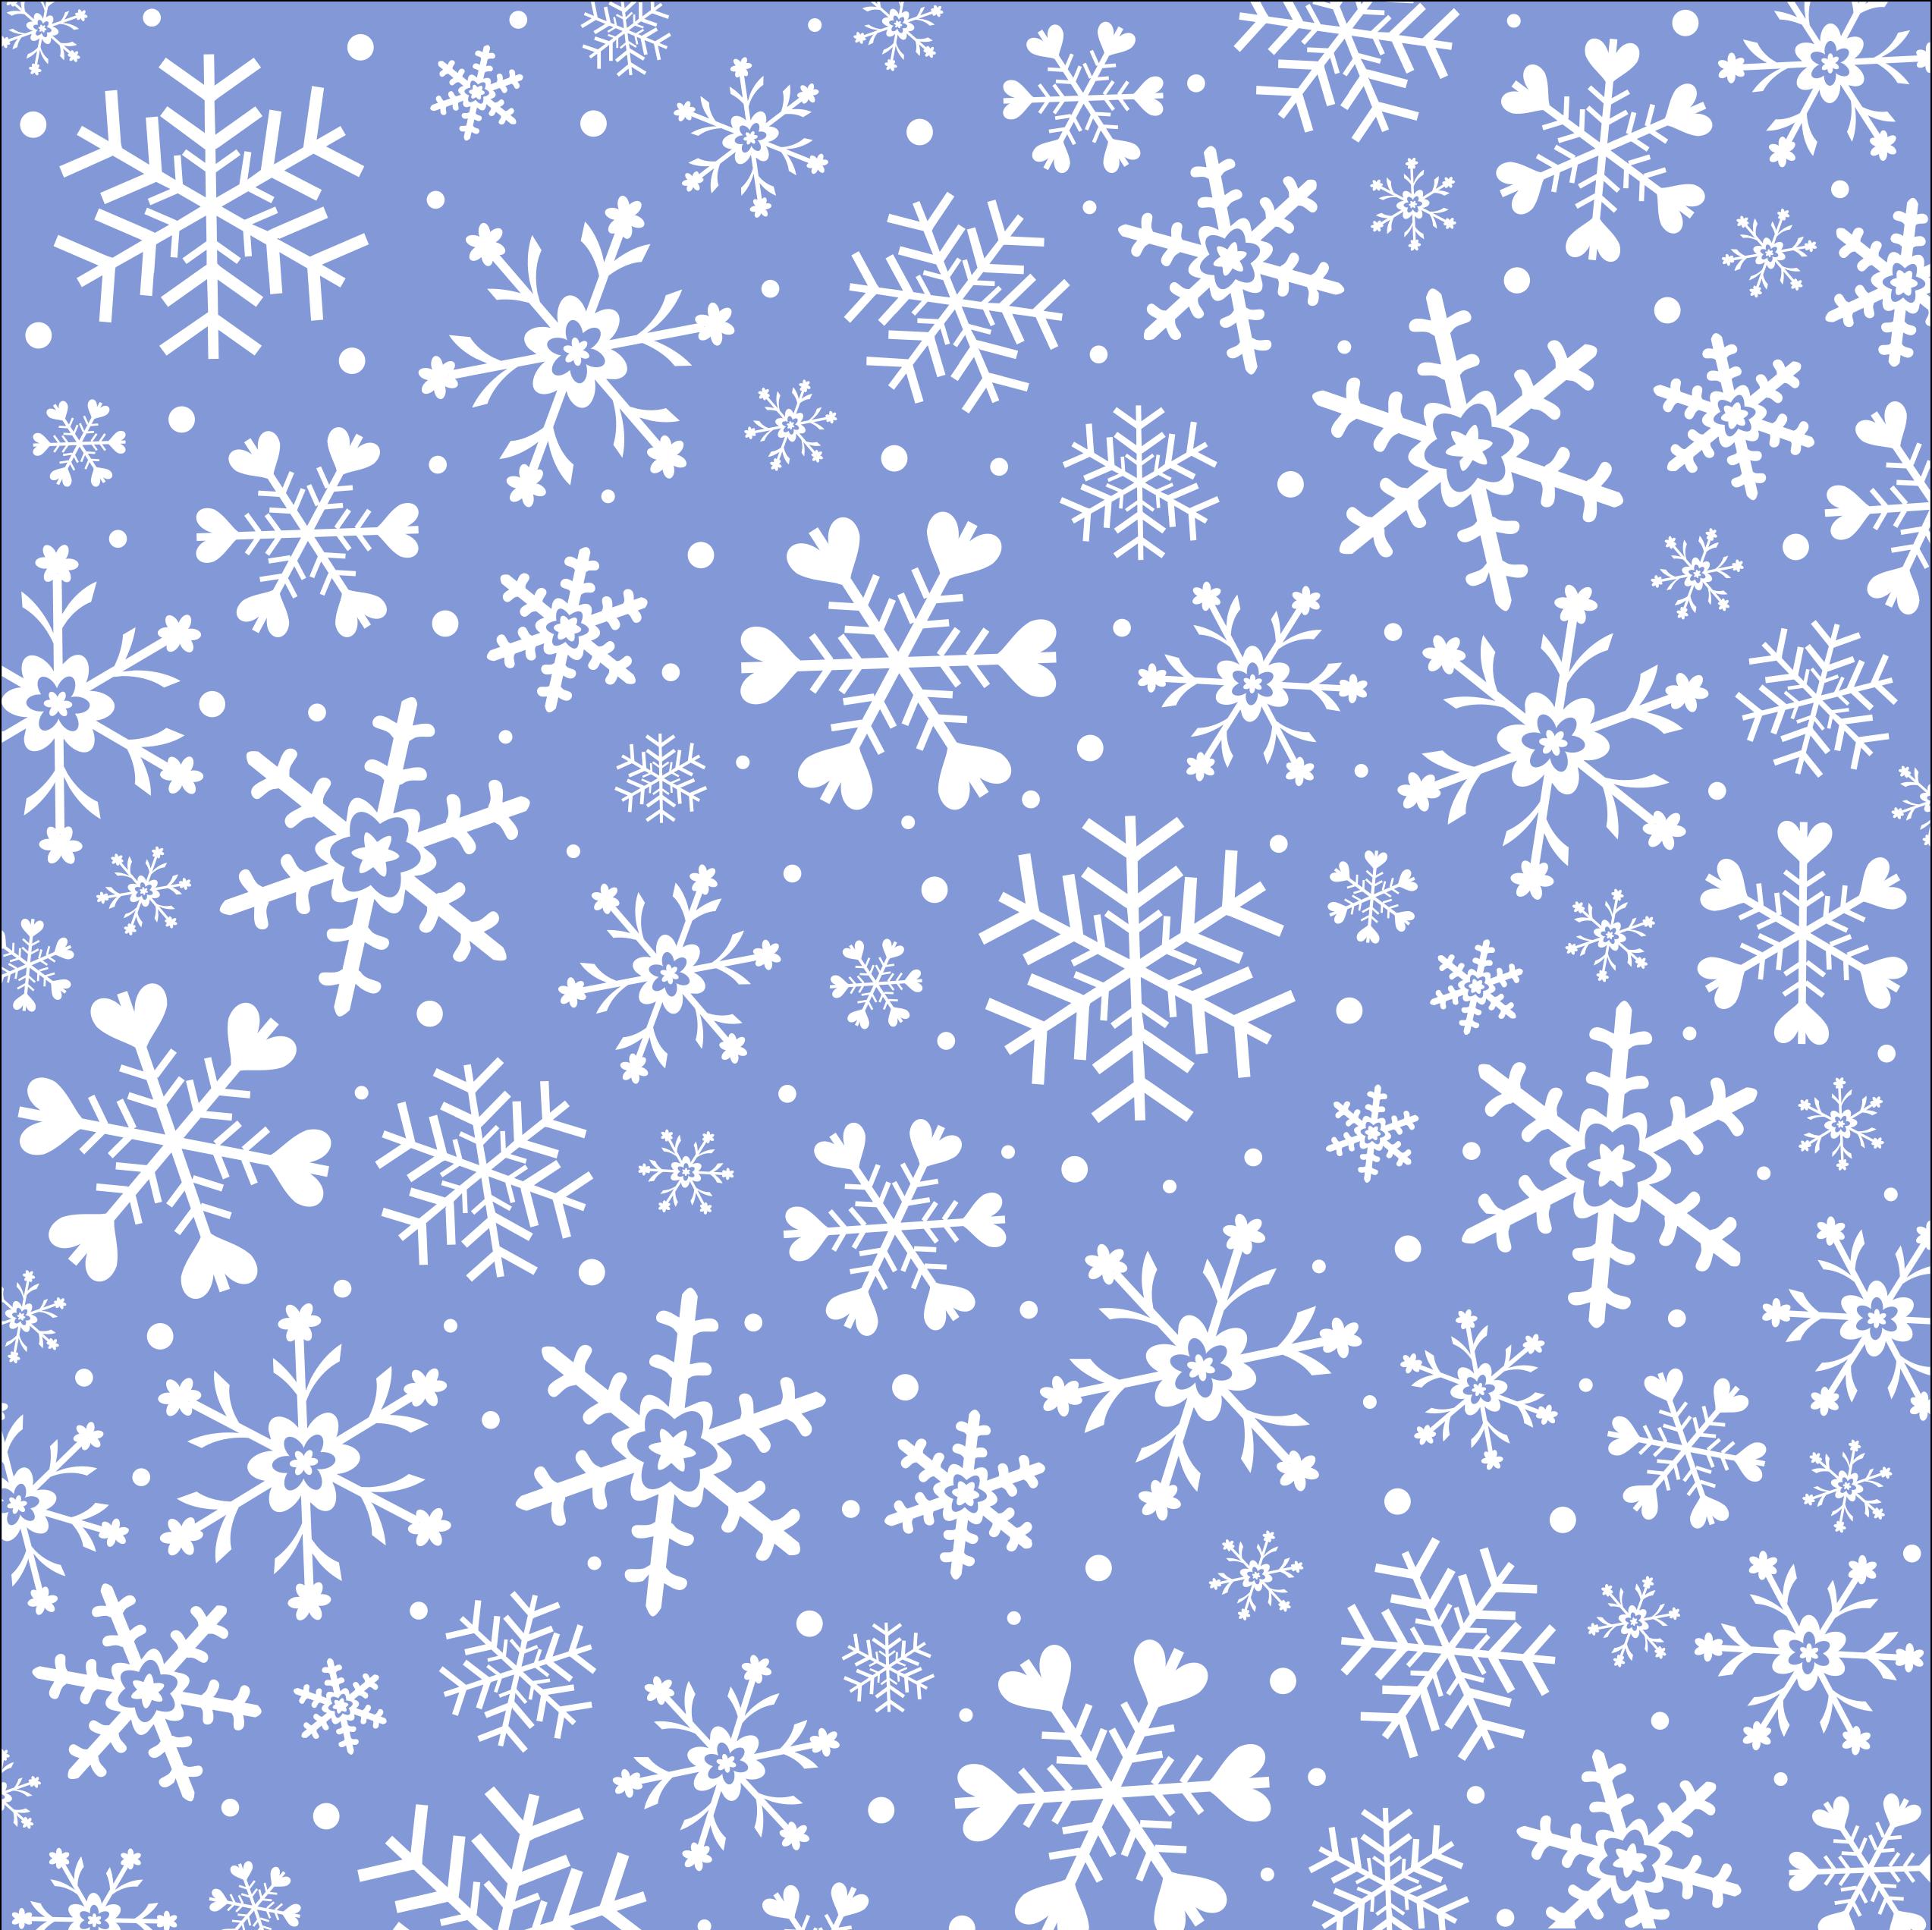 Pics photos merry christmas argyle twitter backgrounds - White Heart Snowflakes On Light Blue